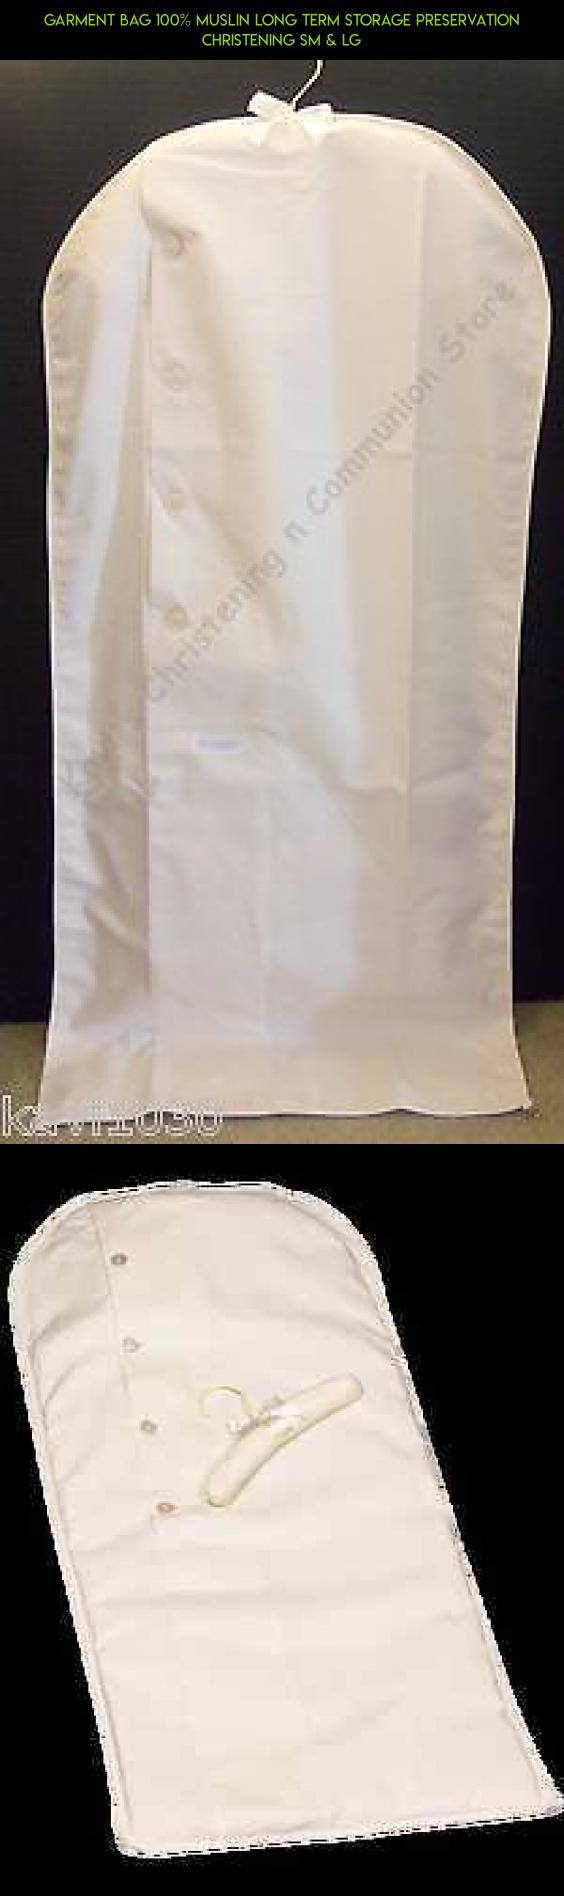 Garment Bag 100% MUSLIN Long Term Storage Preservation Christening Sm & Lg #parts #storage #camera #fpv #drone #technology #garment #gadgets #kit #tech #products #shopping #bag #plans #racing